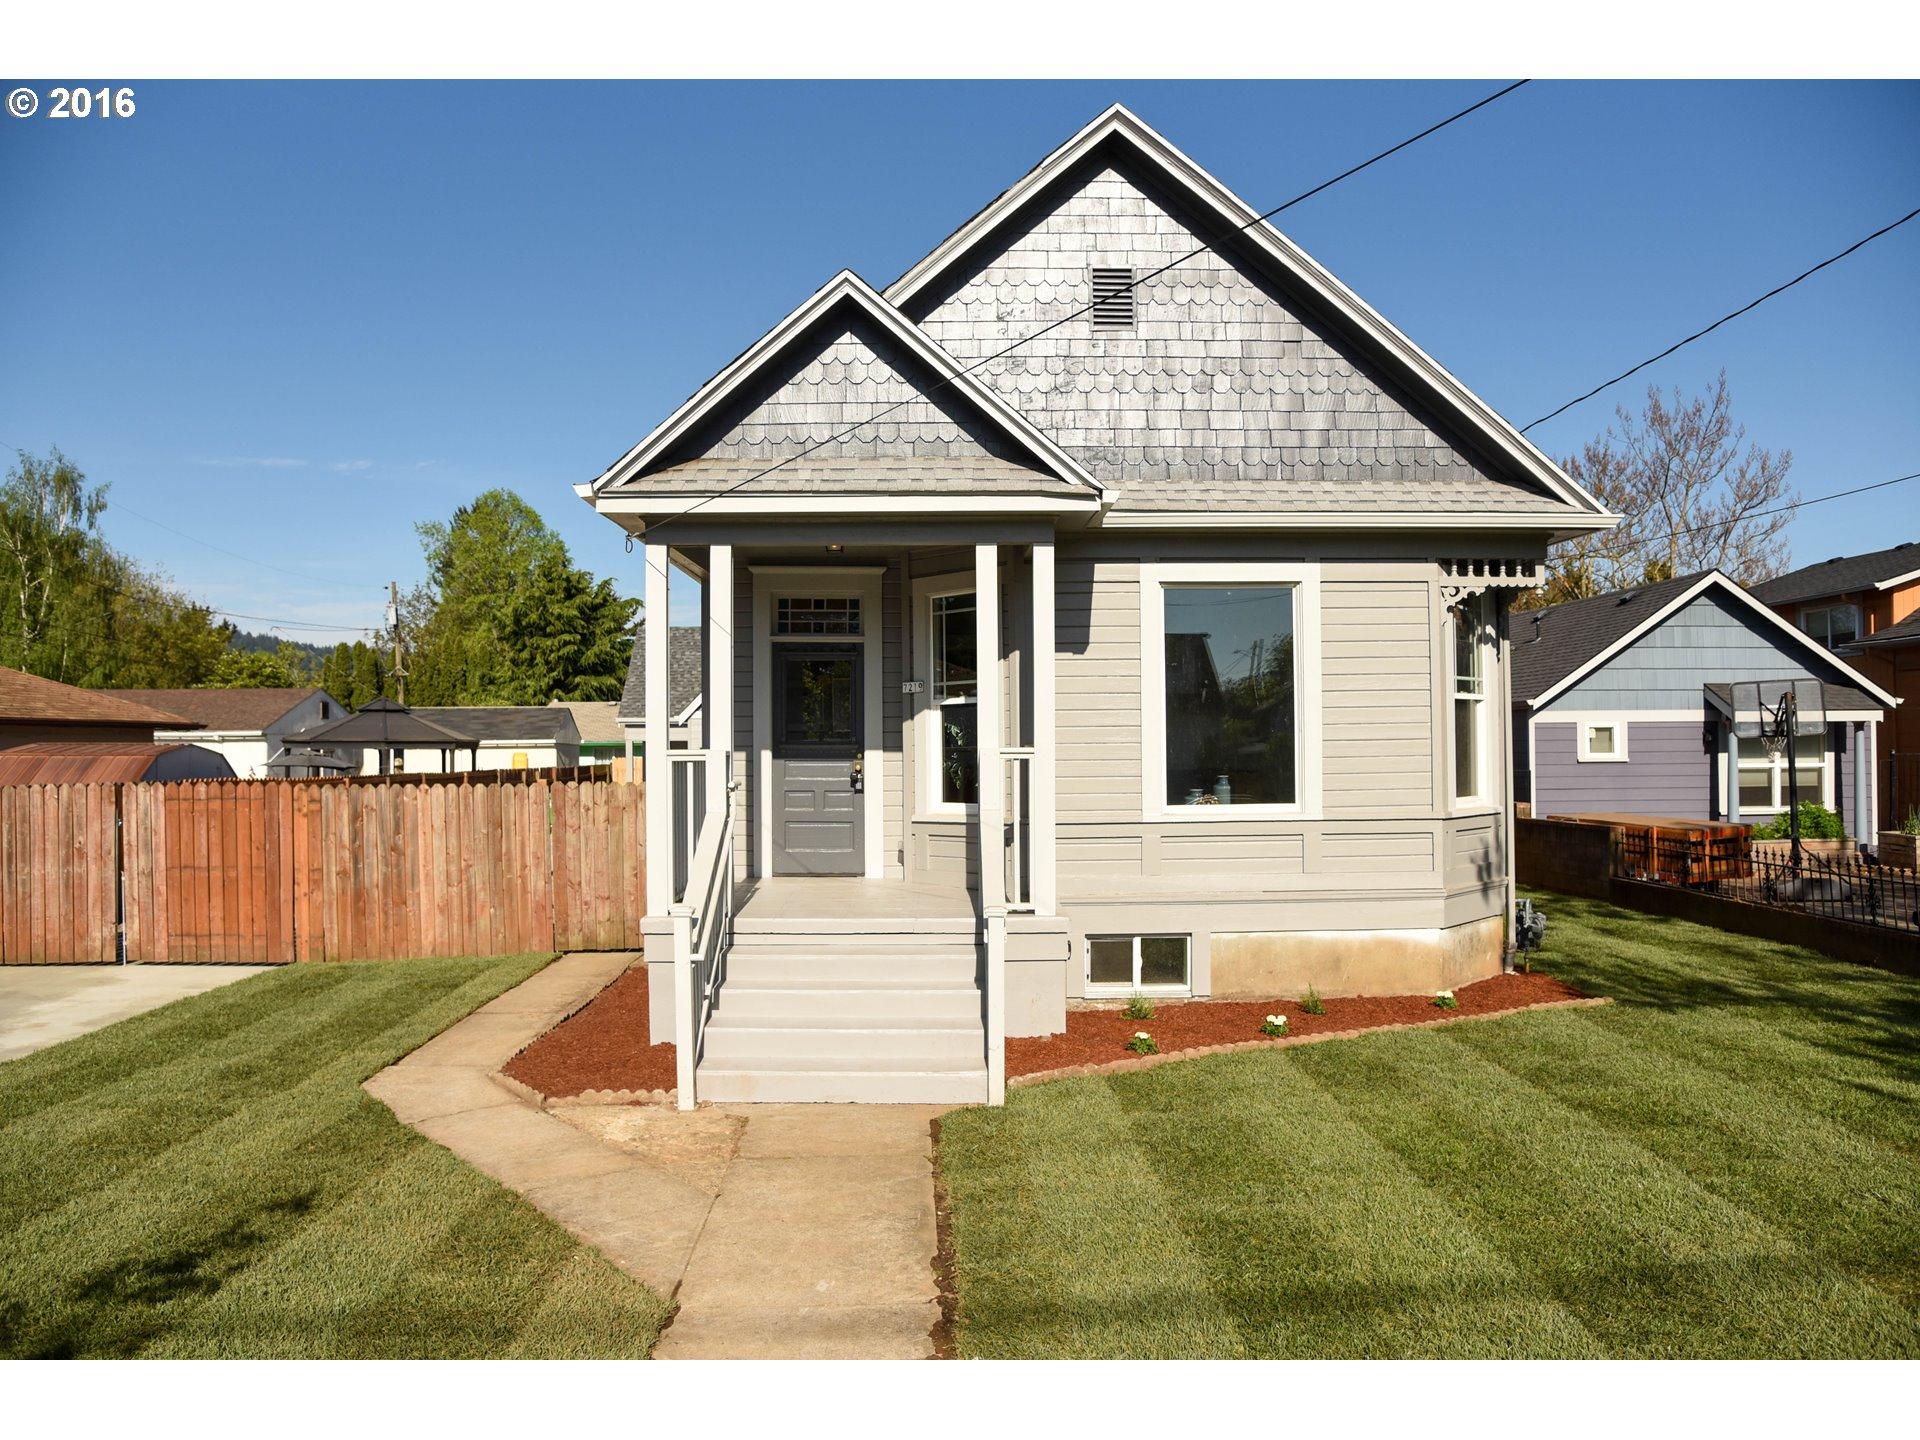 7219 N Tyler Ave, Portland, OR